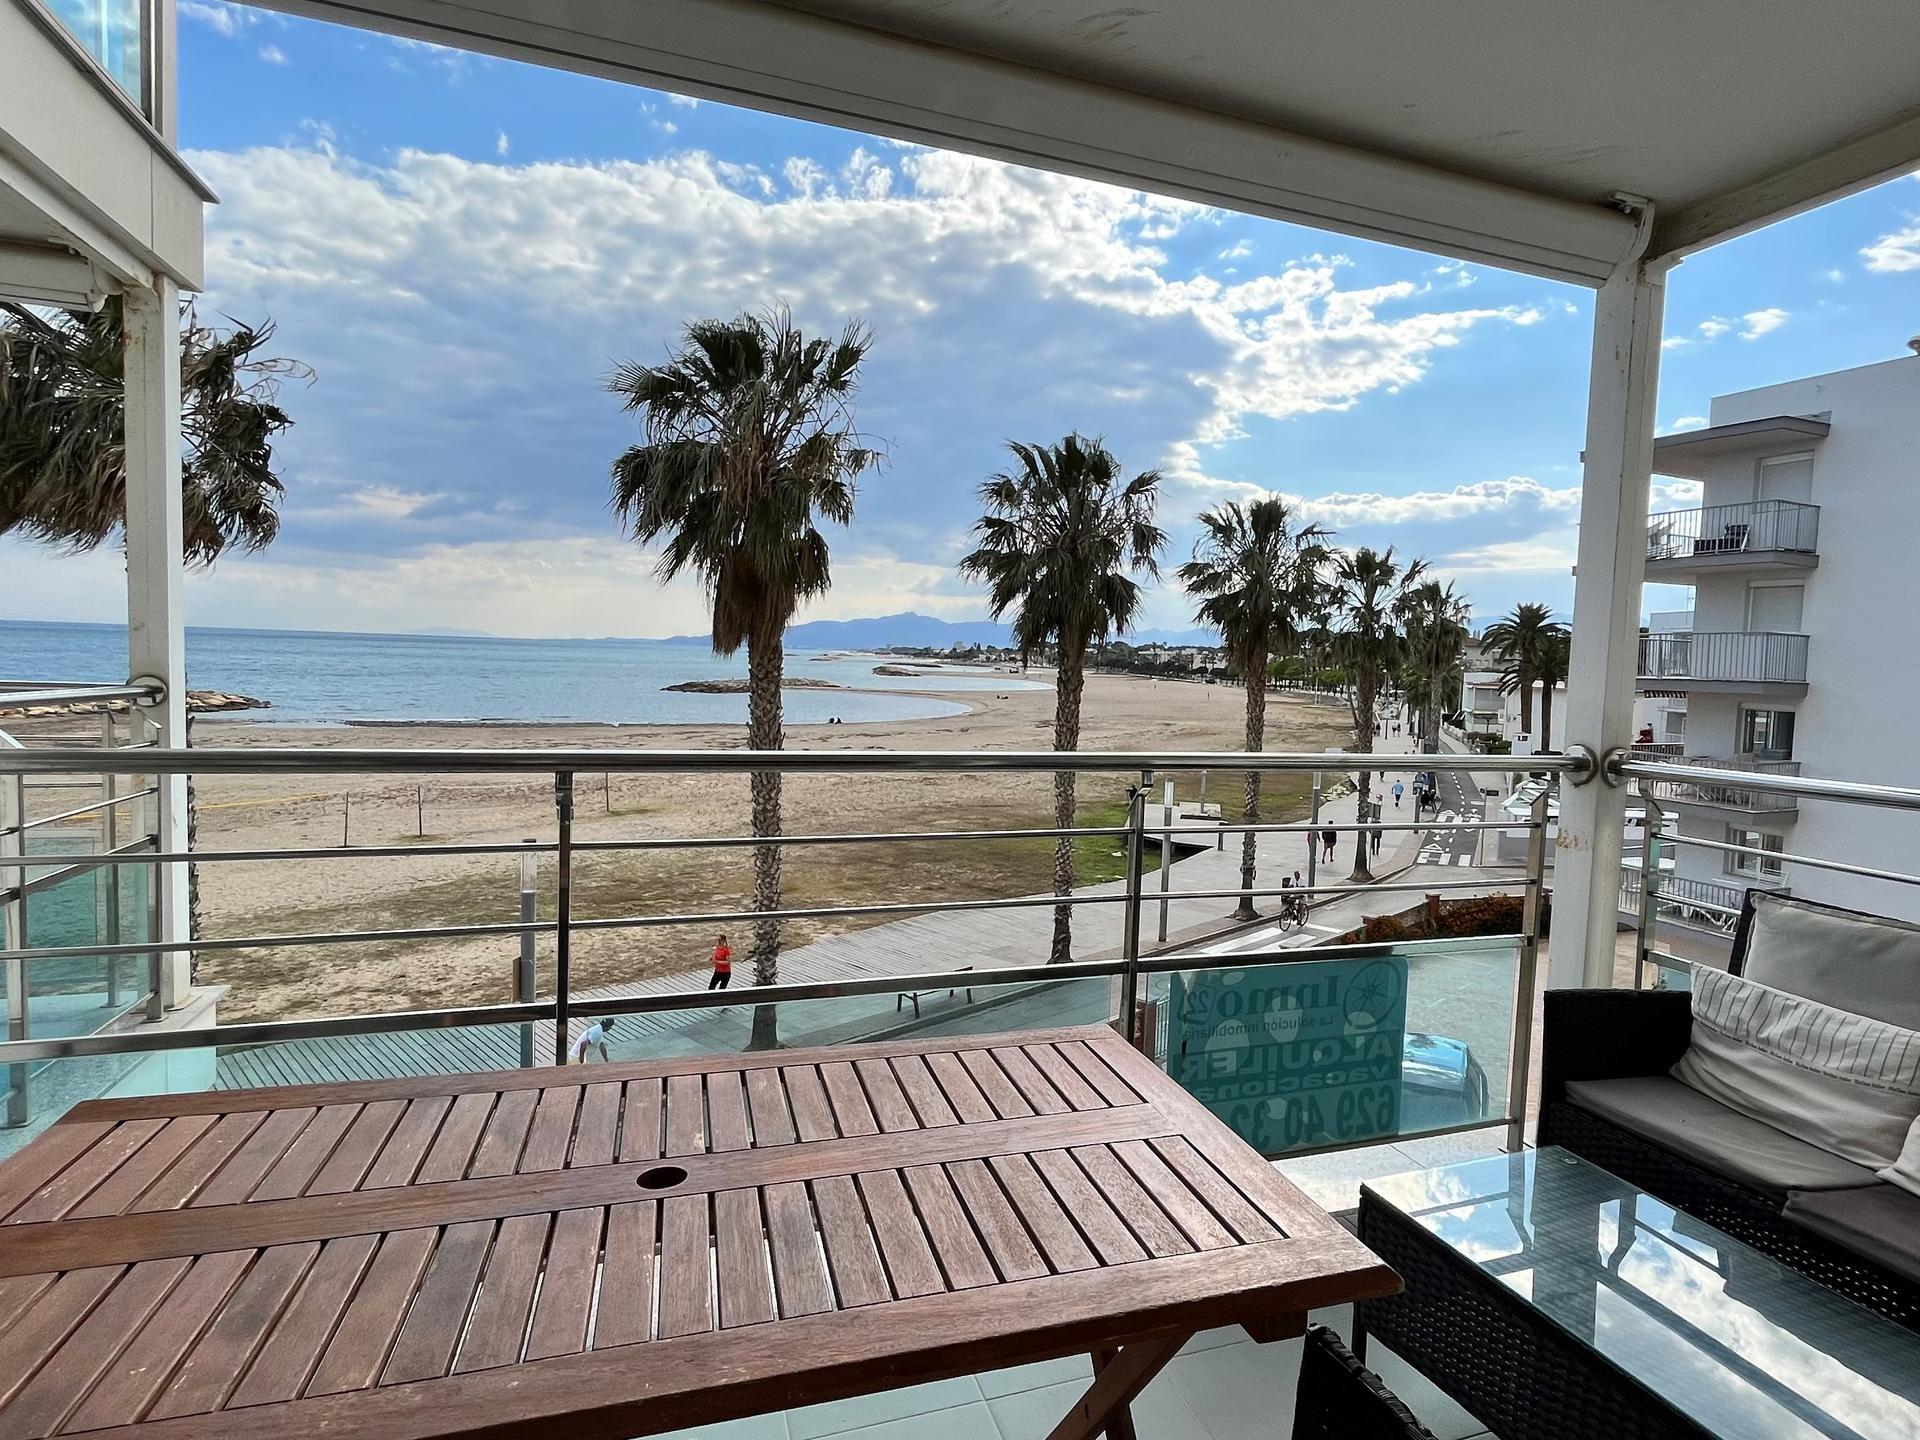 Apartamento -                                       Cambrils -                                       1 dormitorios -                                       4 ocupantes